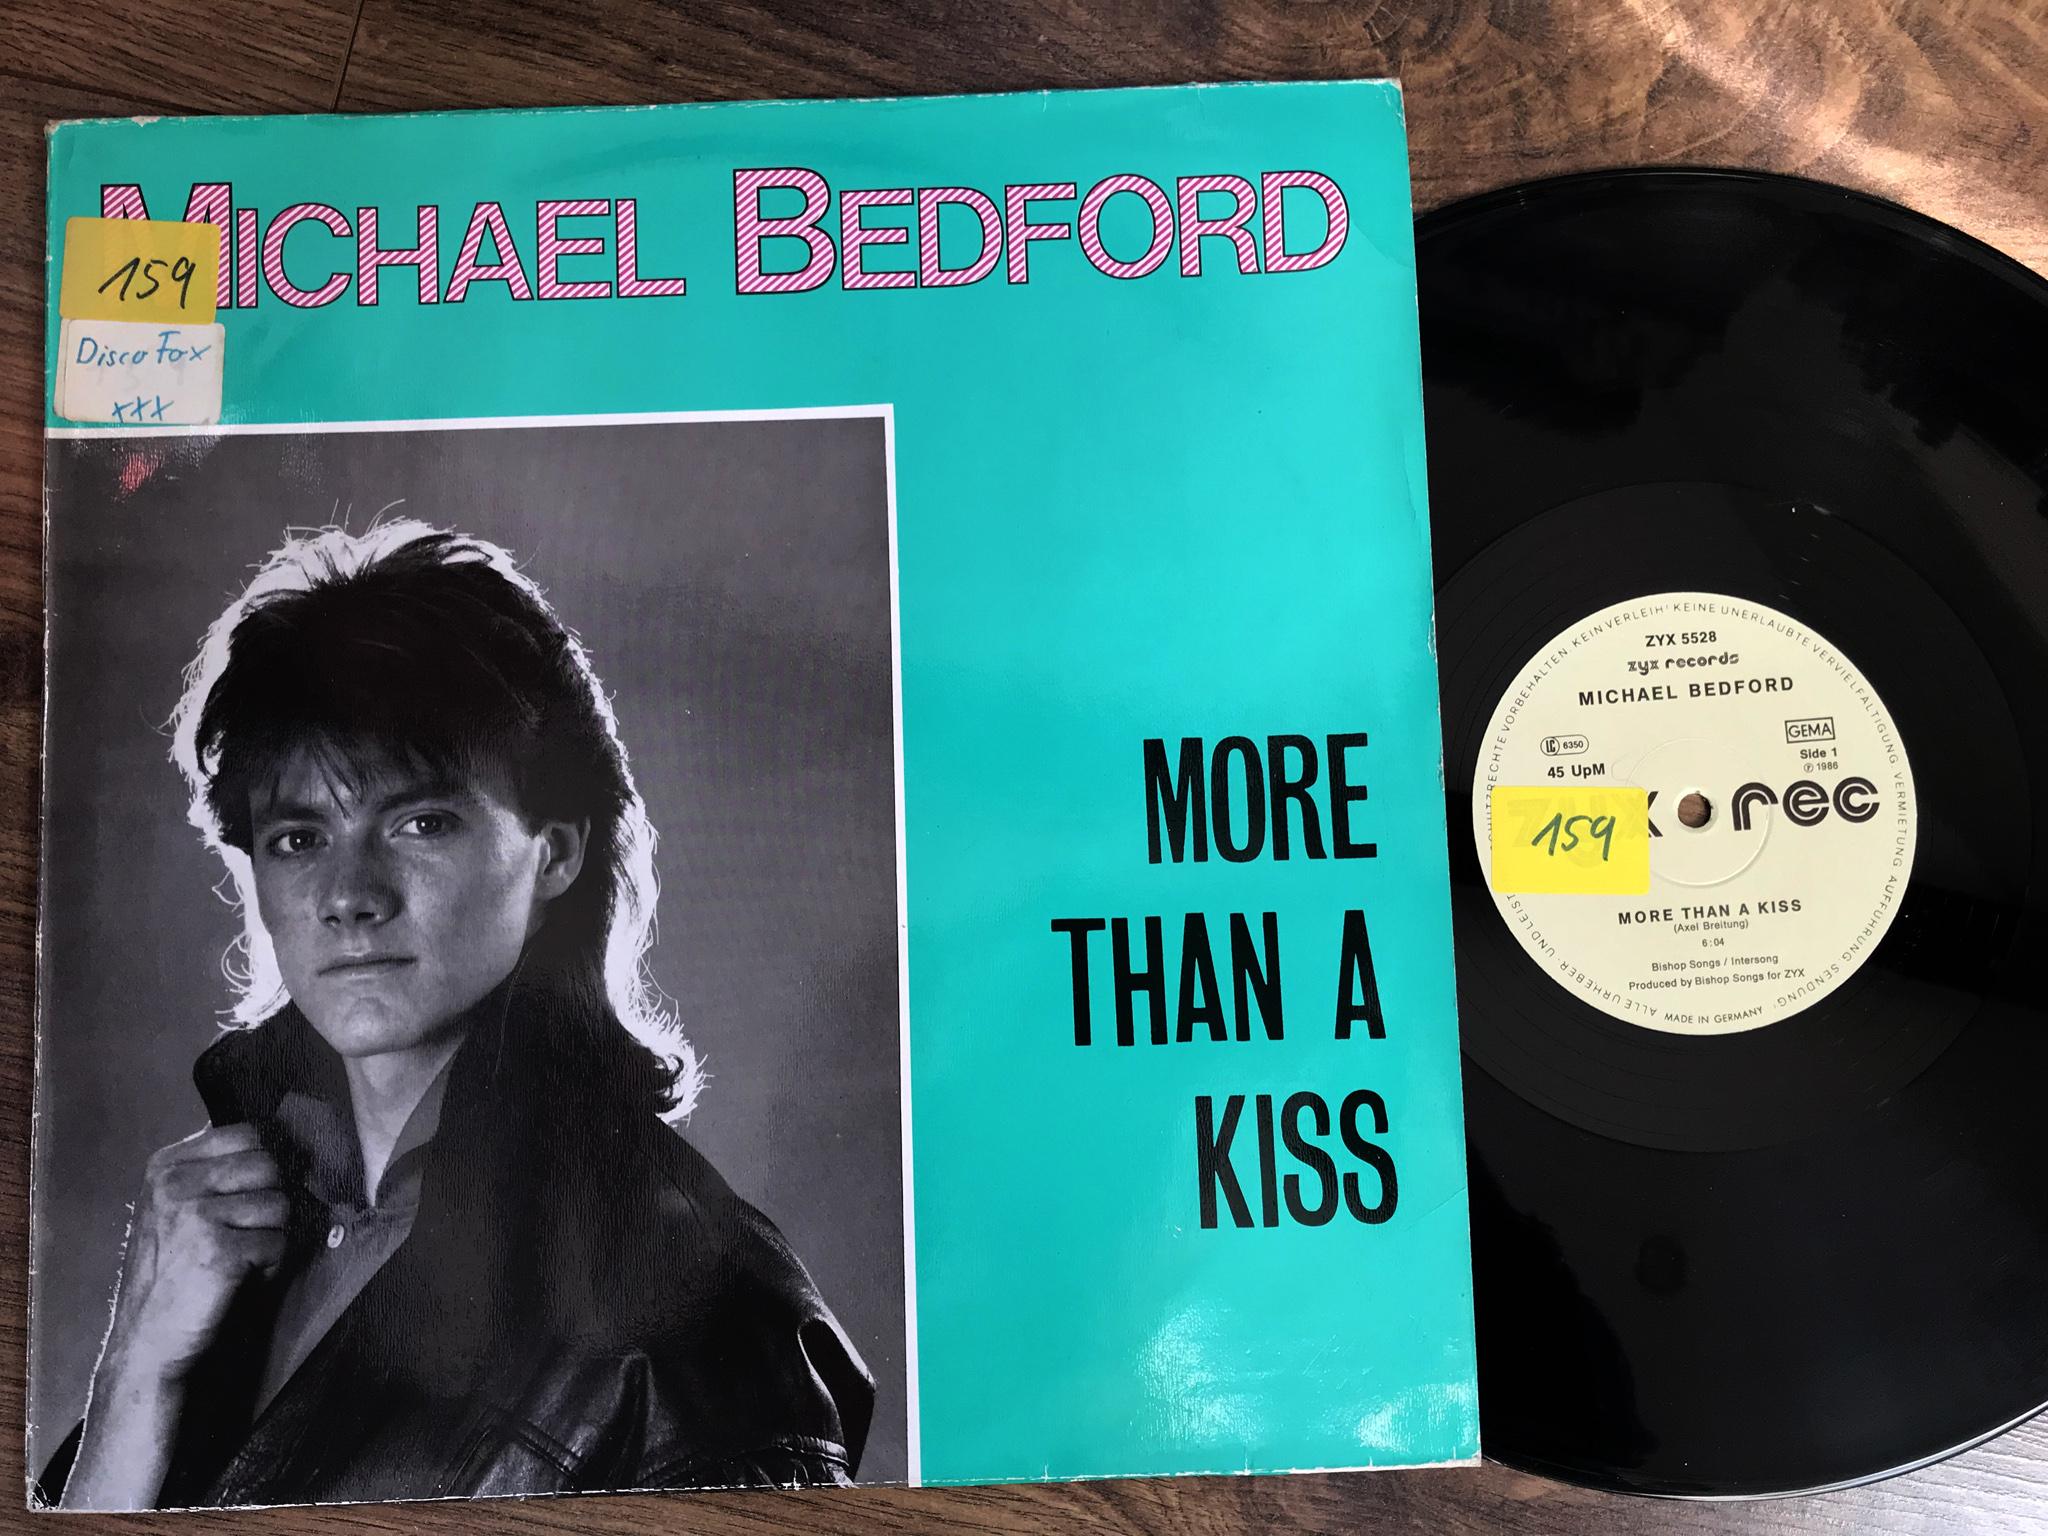 Michael Bedford - More Than A Kiss